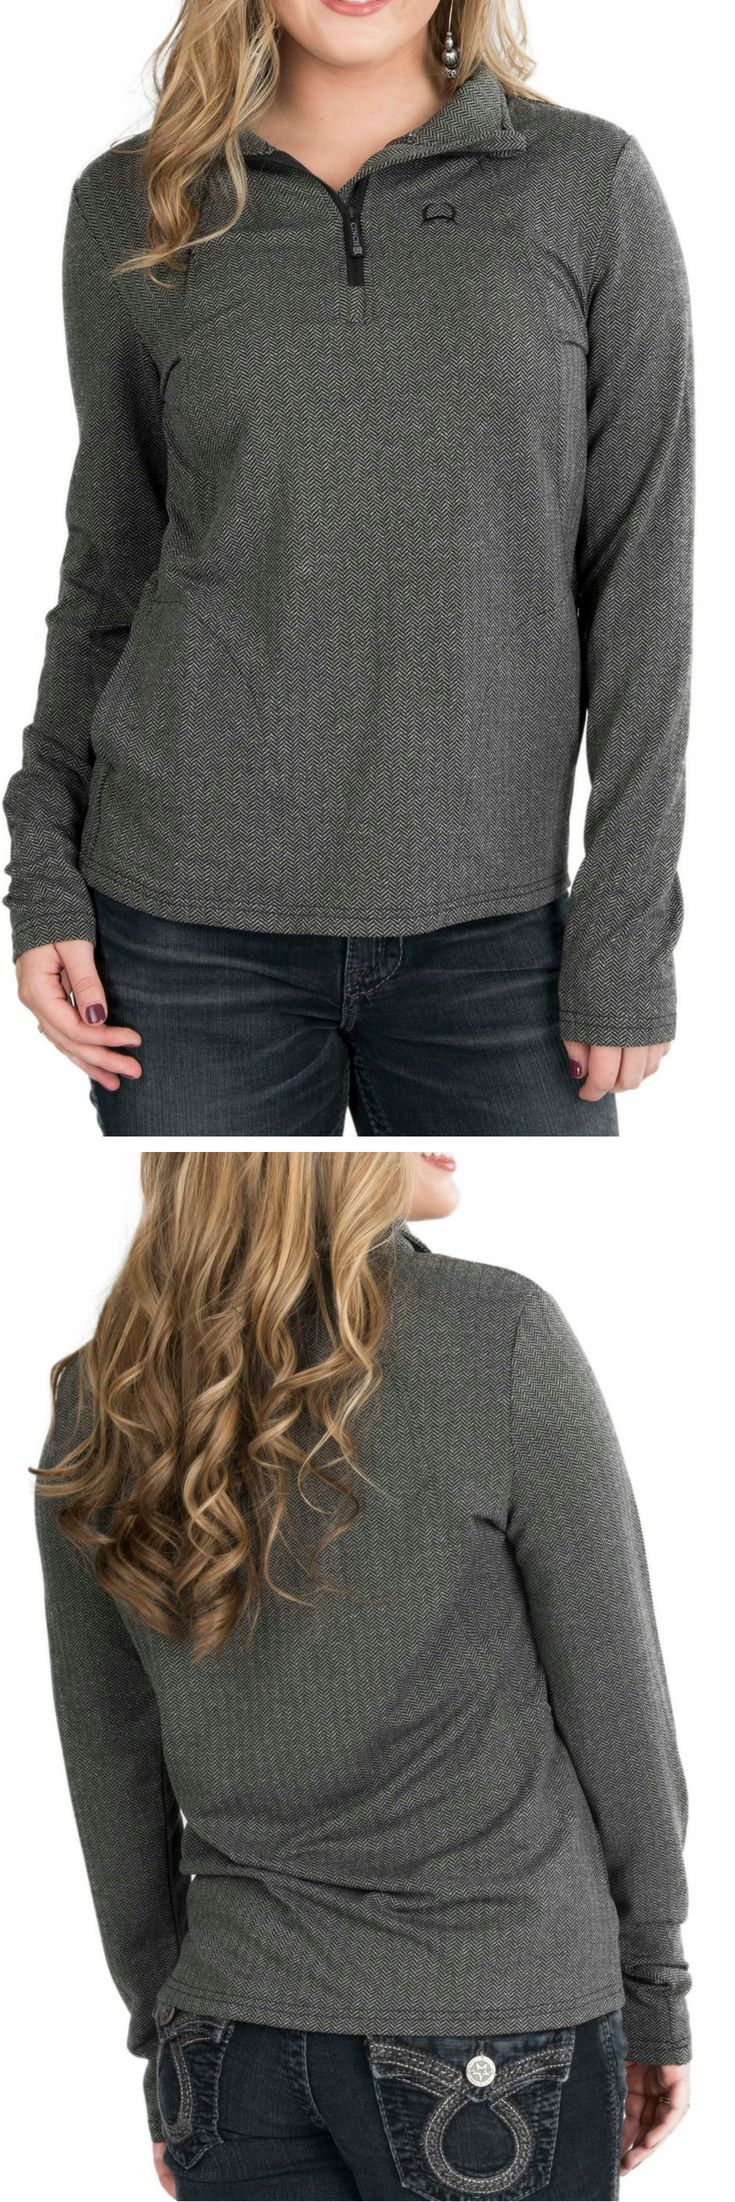 Cinch Women's Grey Long Sleeve Pull Over Jacket